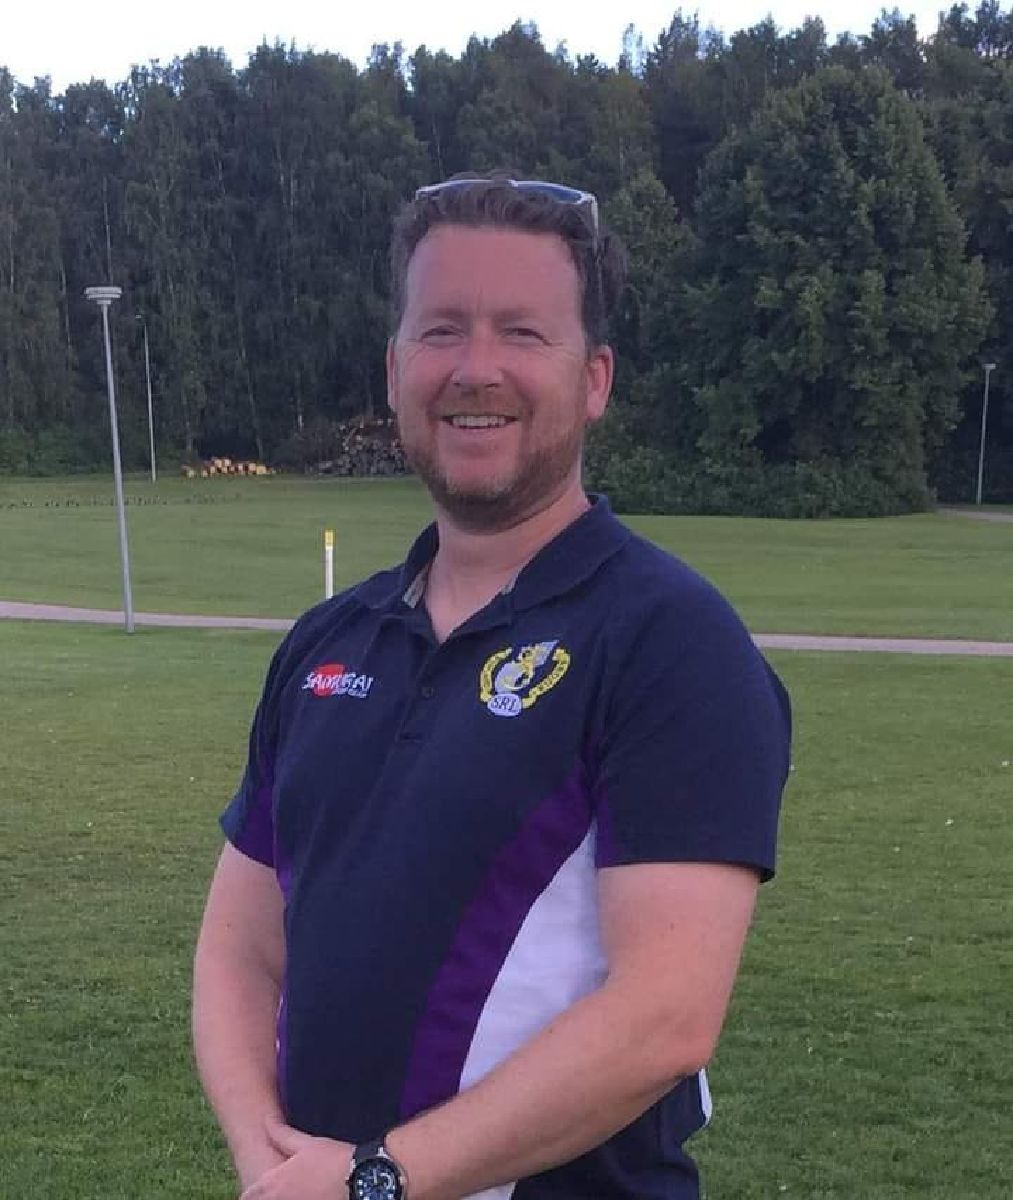 Rugbyliiton toiminnanjohtaja vaihtuu